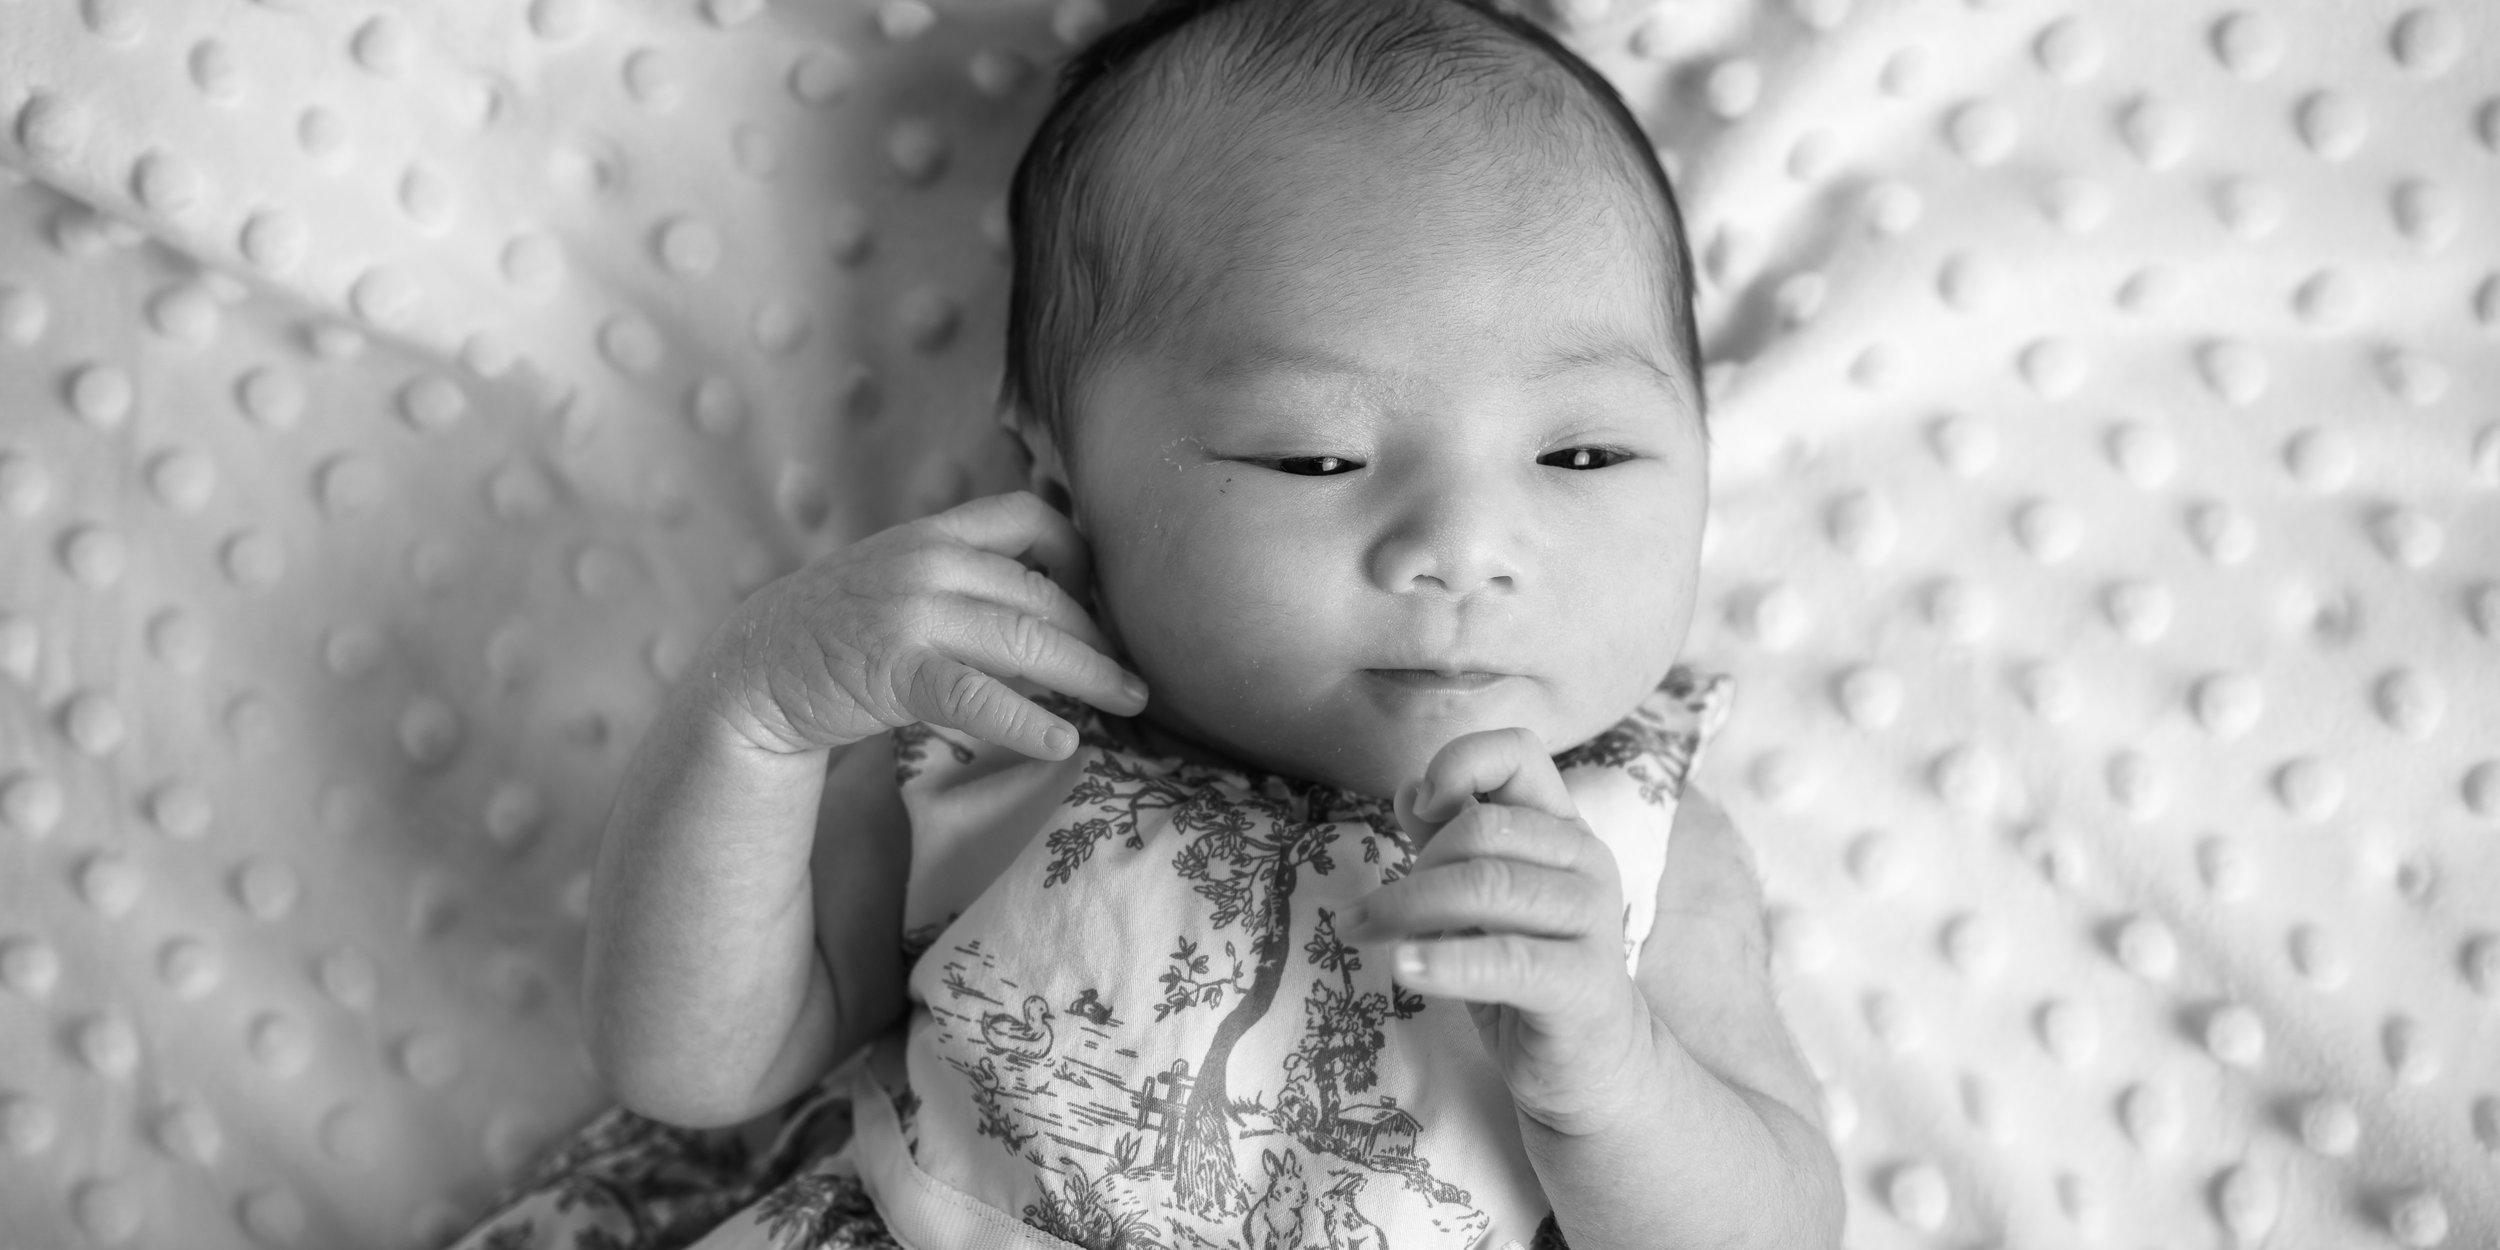 Capitola Newborn Family Photography - photos by Bay Area portrai